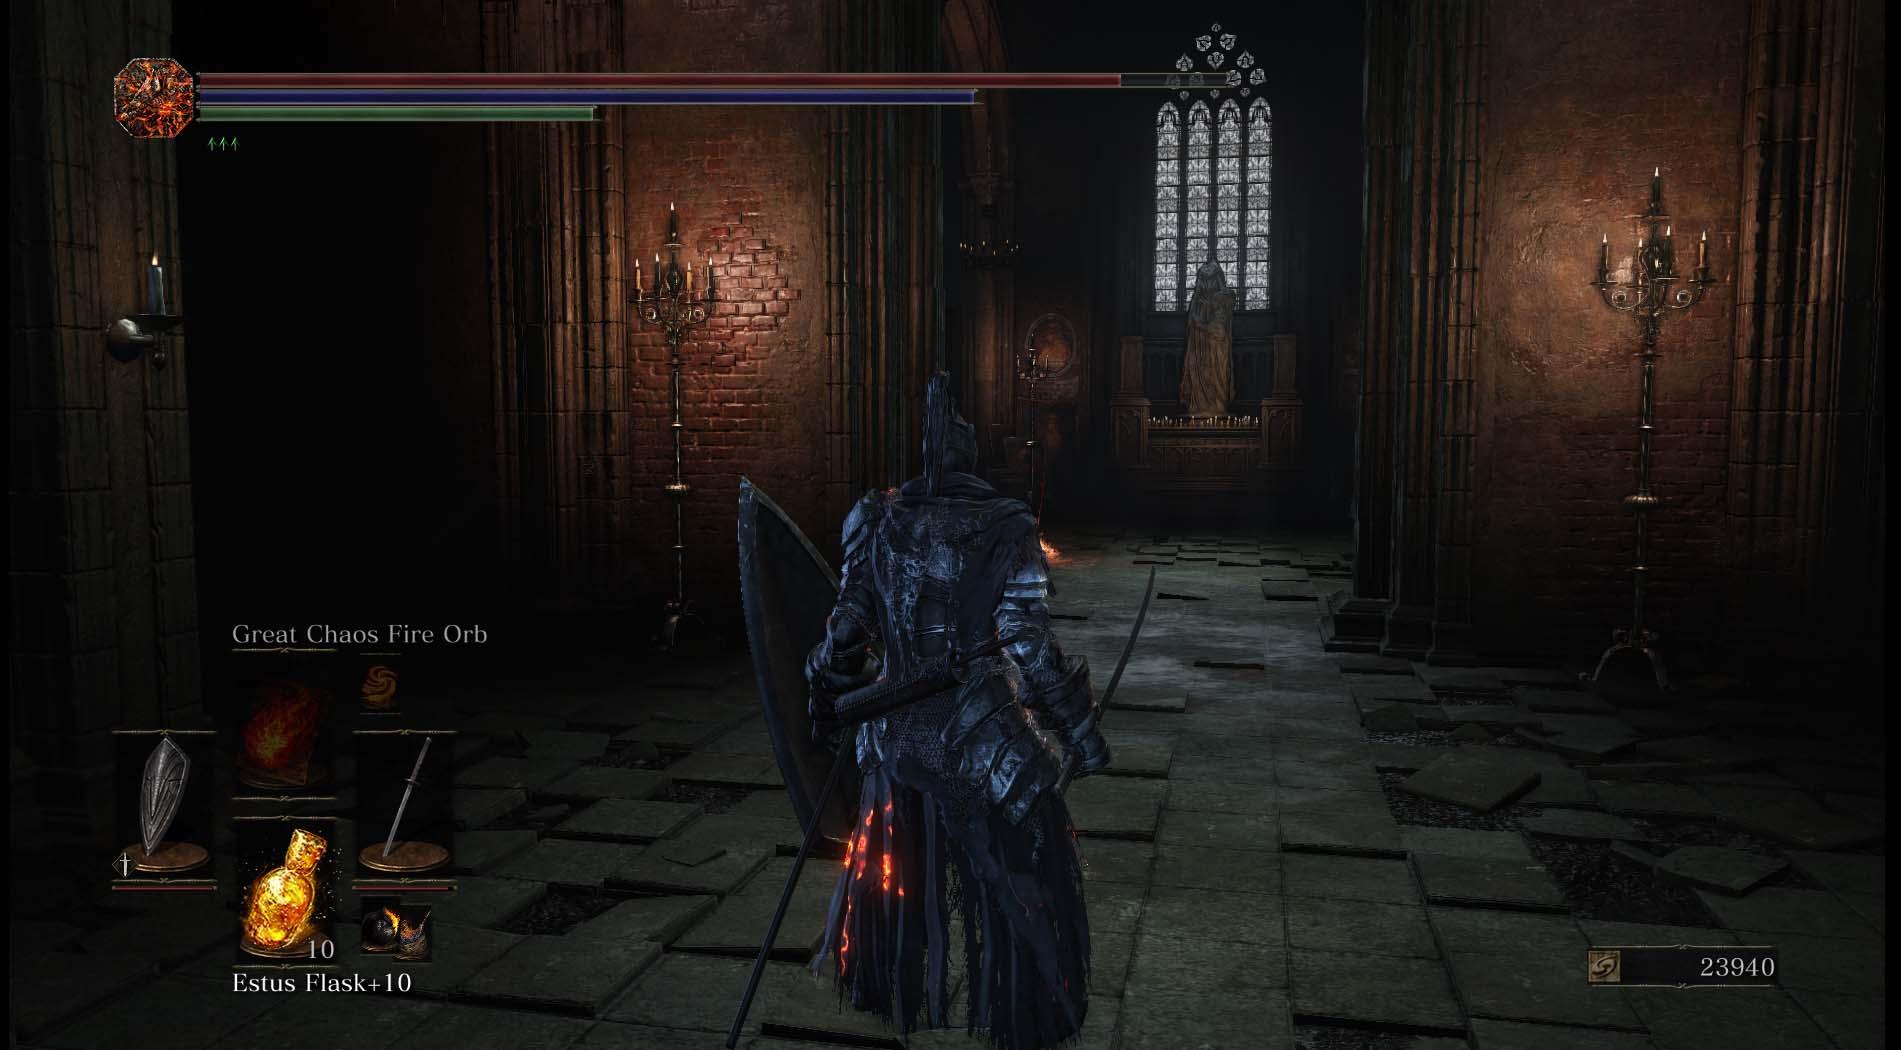 dark-souls-iii-ashes-of-ariandel-3